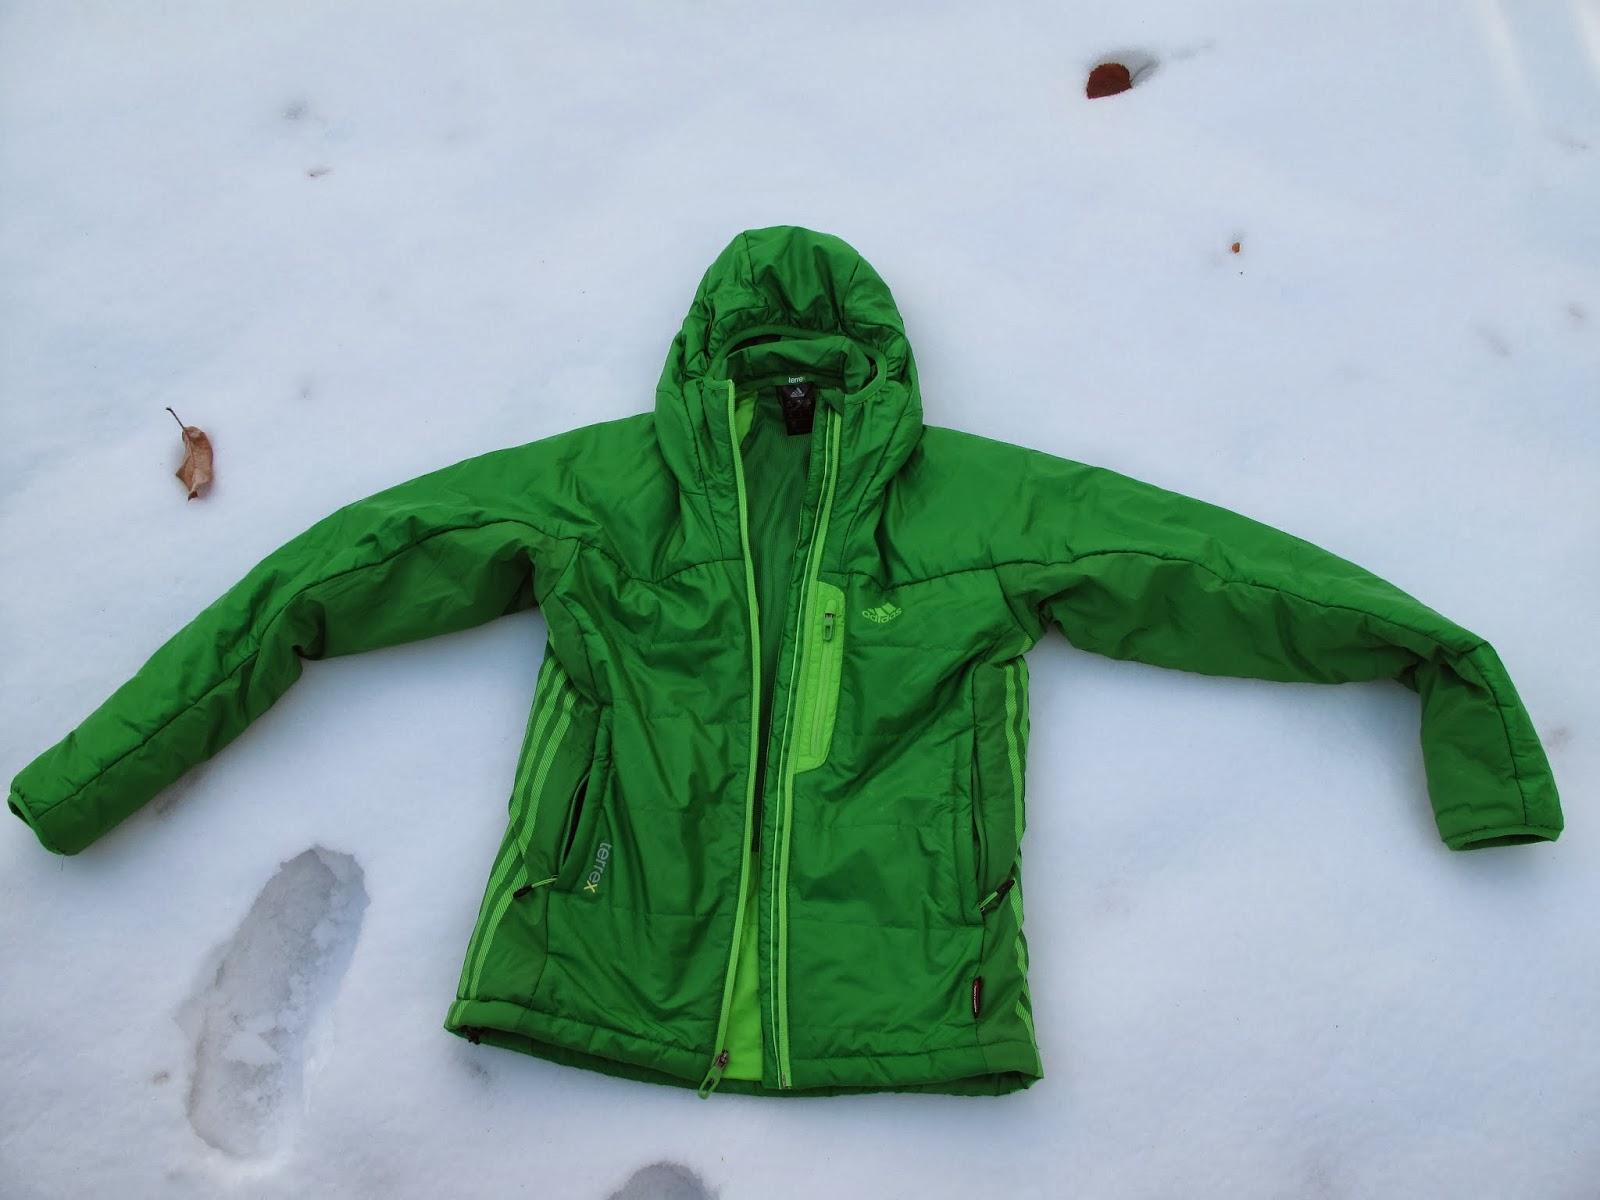 Bergsteigen & Klettern Adidas Terrex W TX NDOSPHERE Winter Hoodie Jacke  Women Jacket Outdoor Weitere Sportarten